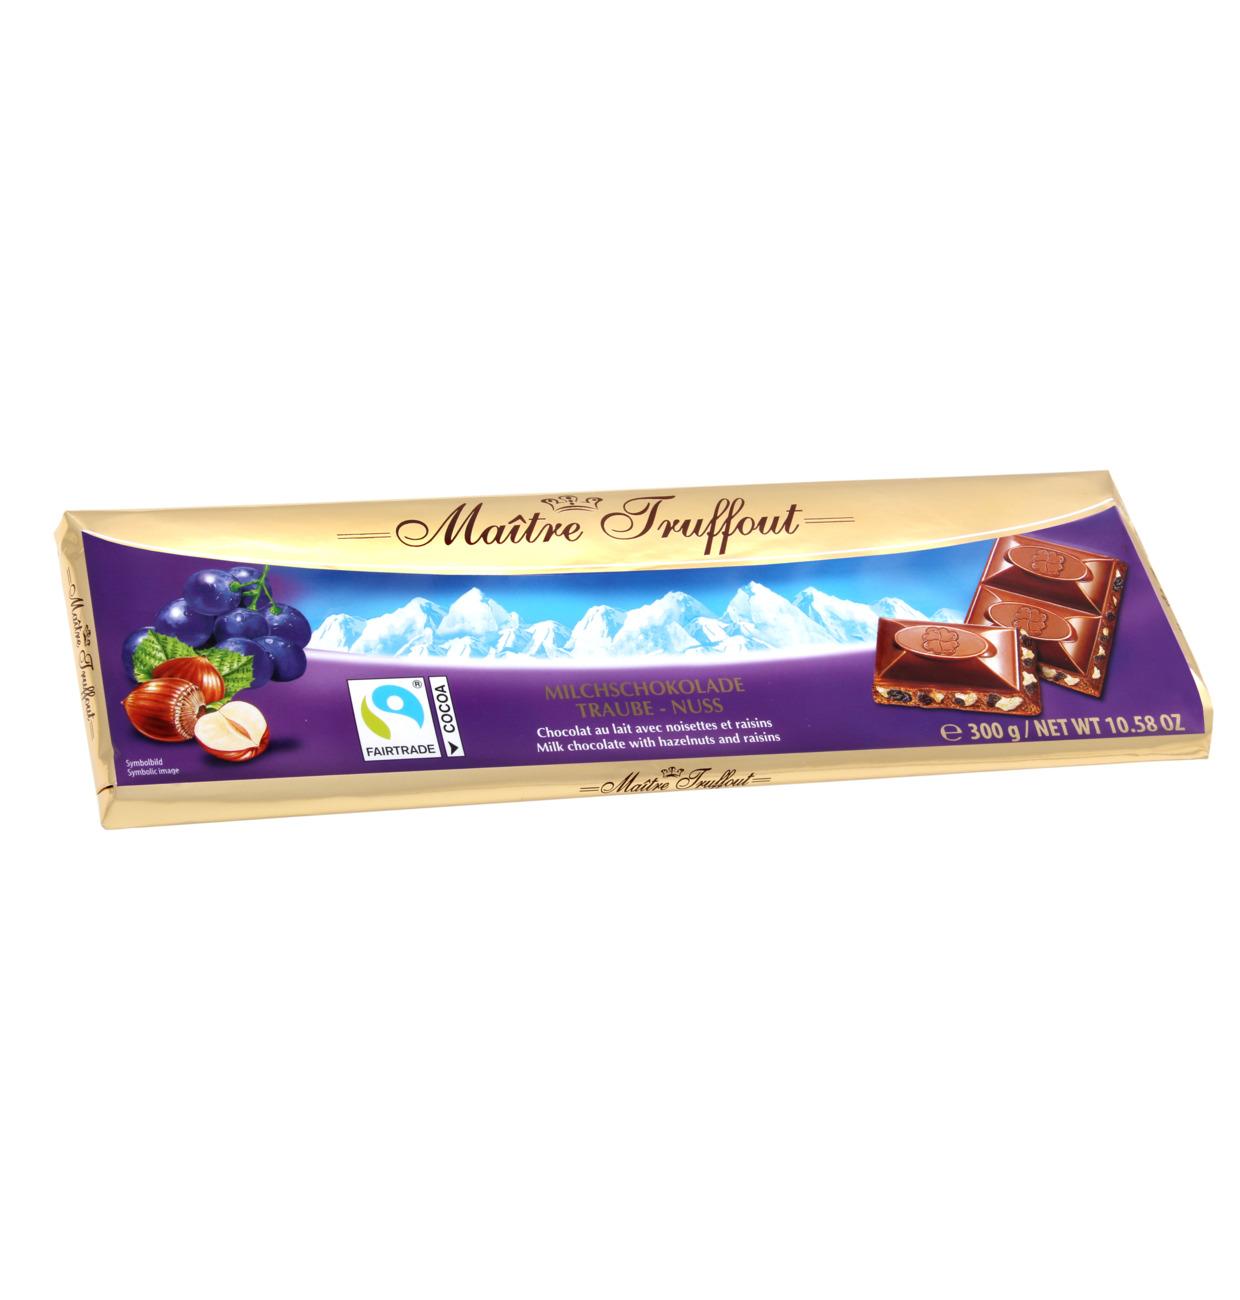 Milchschokolade Traube Nuss